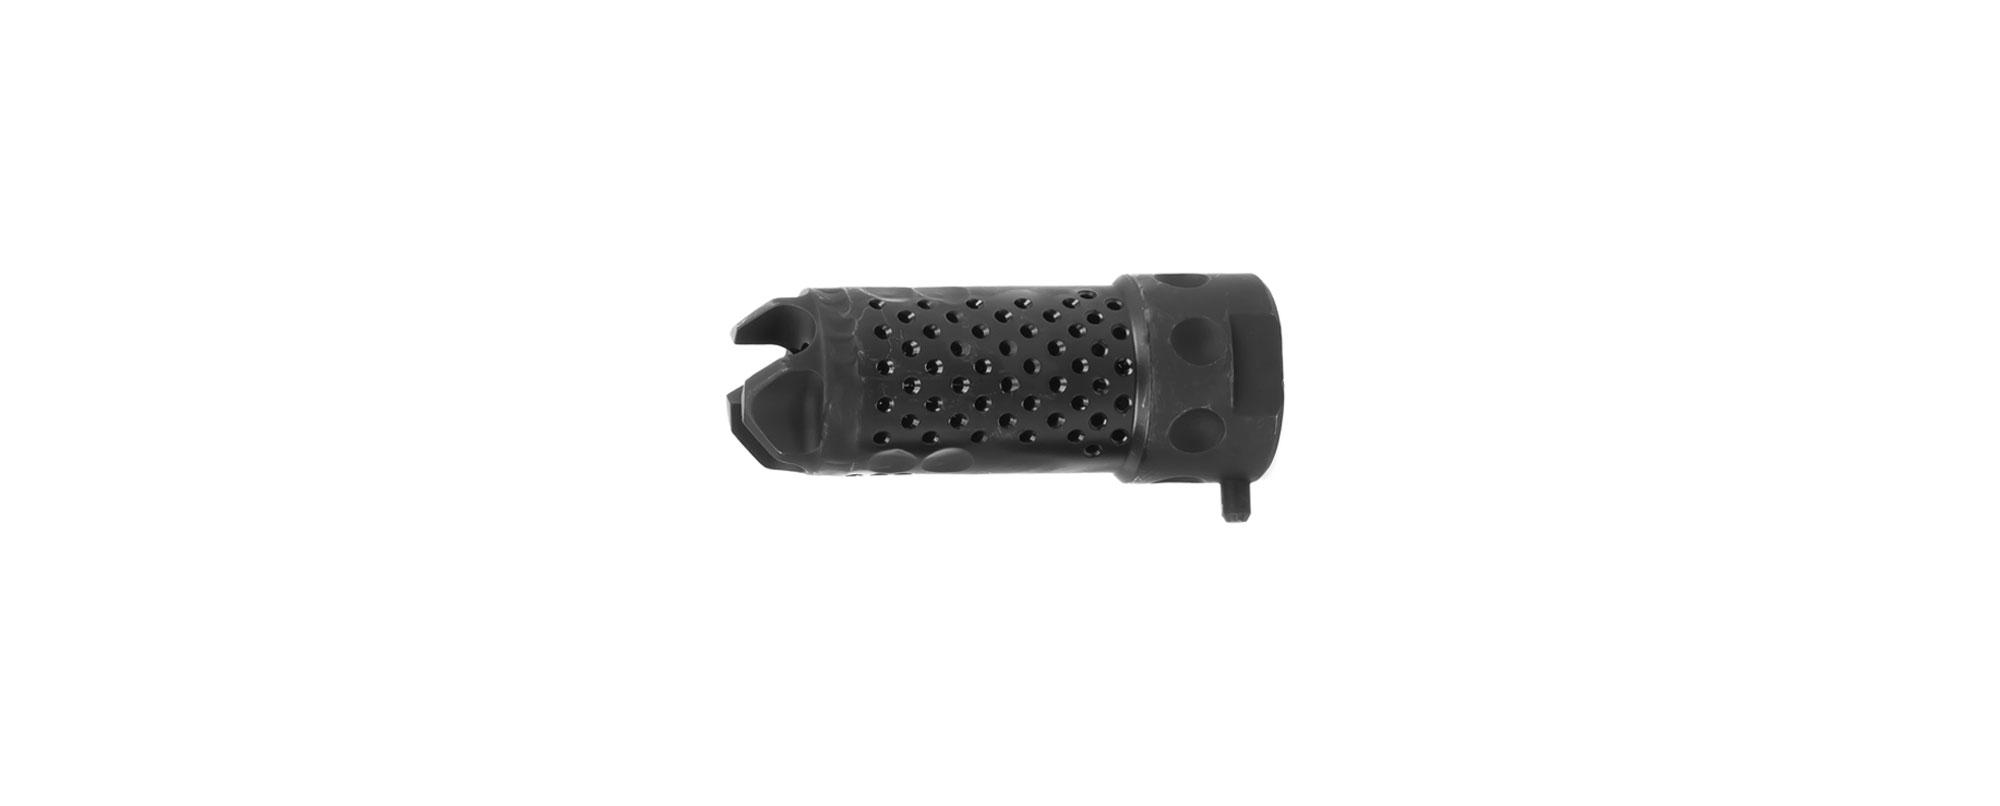 5 56mm QDC MAMS Muzzle Brake Kit